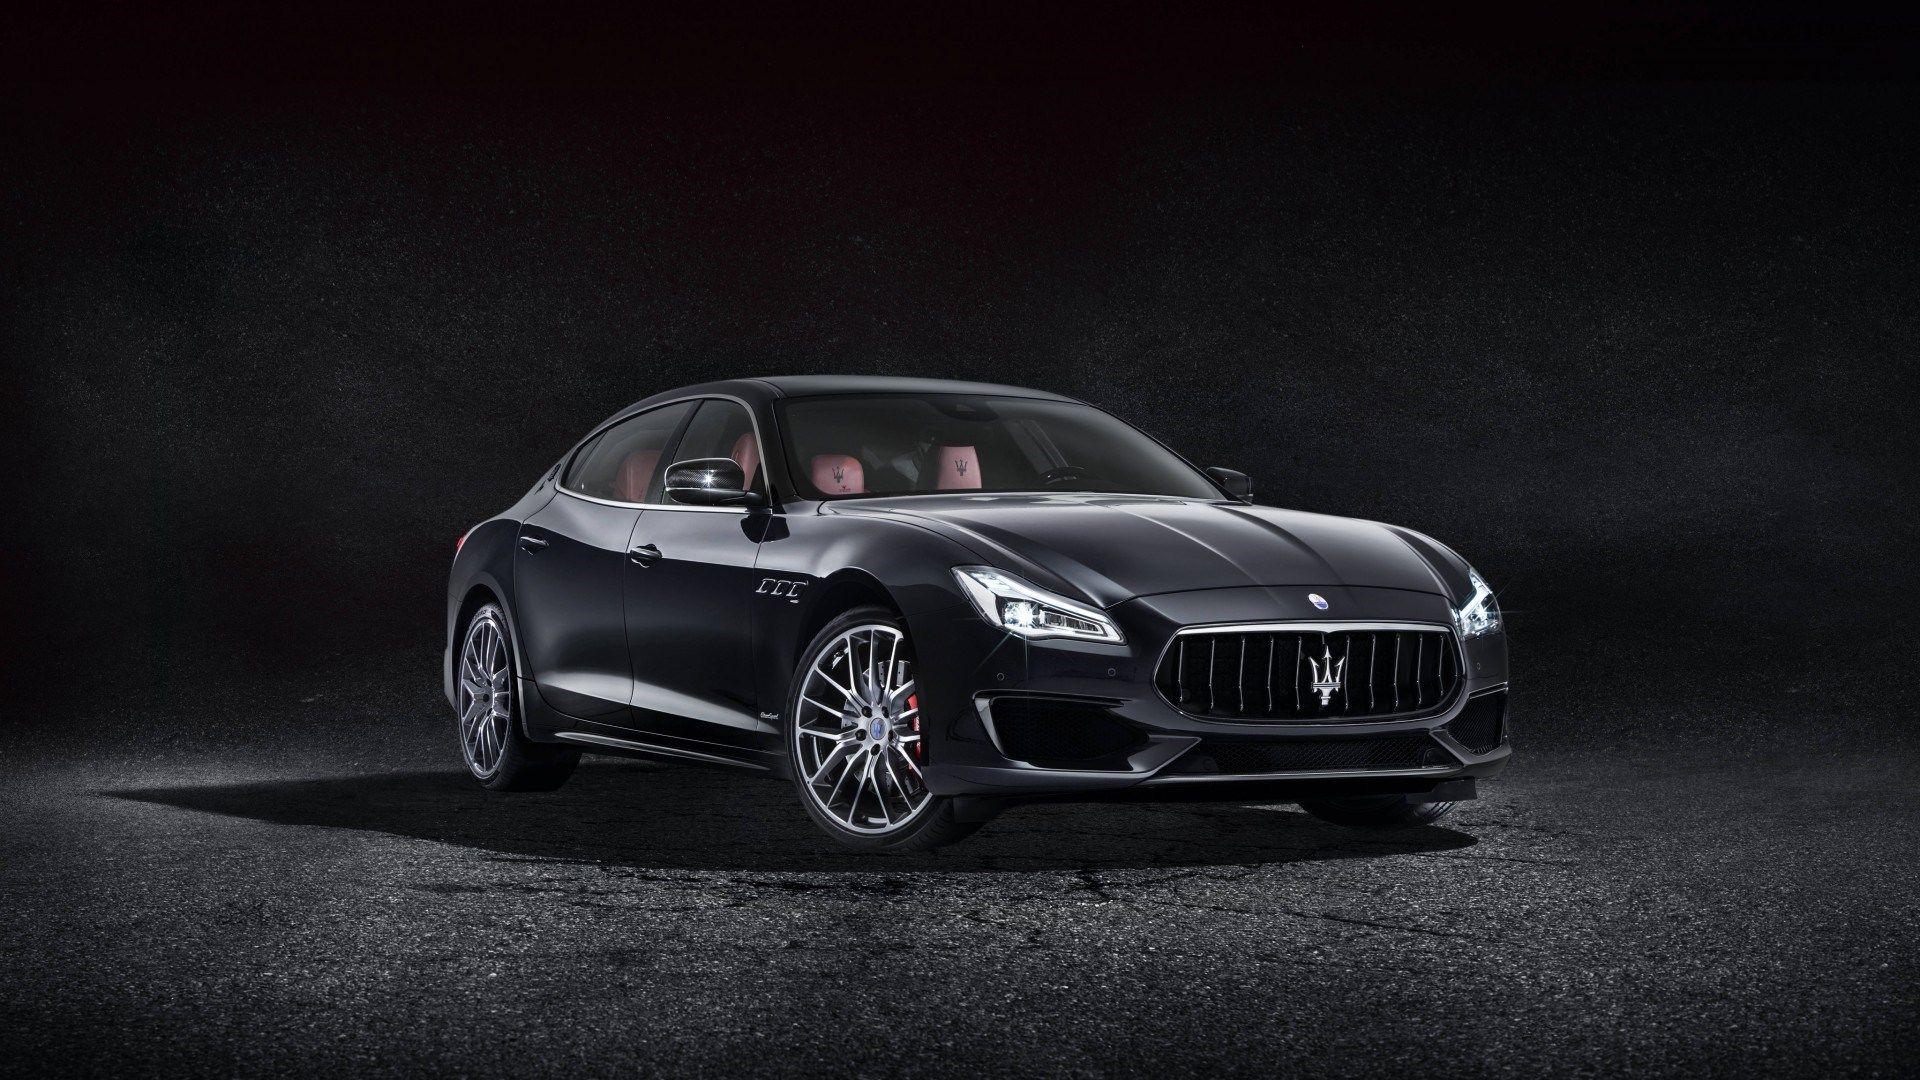 Best 10mn Wallapapers Maserati Quattroporte Maserati Maserati Quattroporte Gts